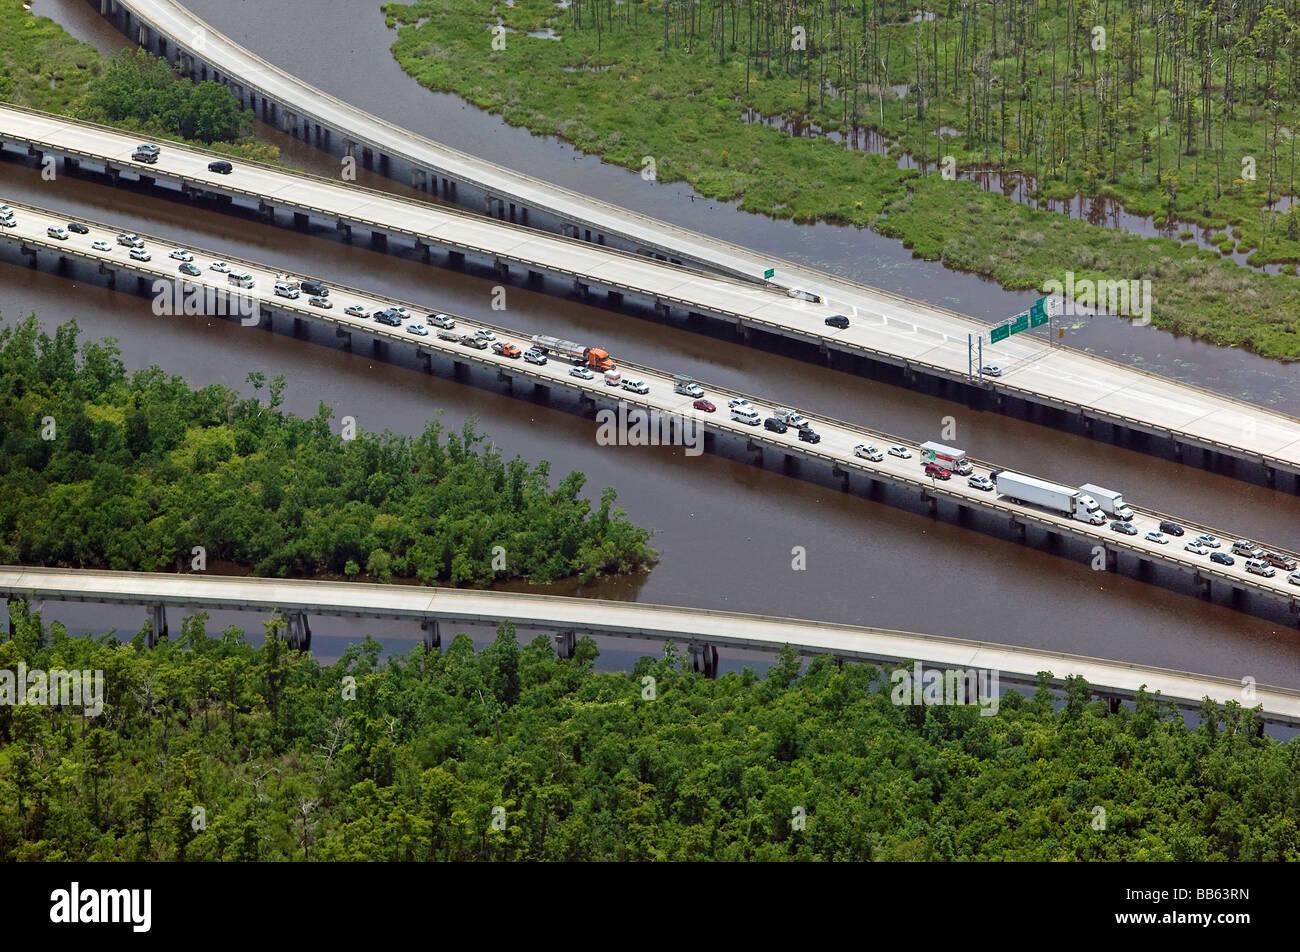 aerial view above heavy traffic leaving New Orleans Louisana metropolitan area on Interstate 10 crossing wetlands - Stock Image